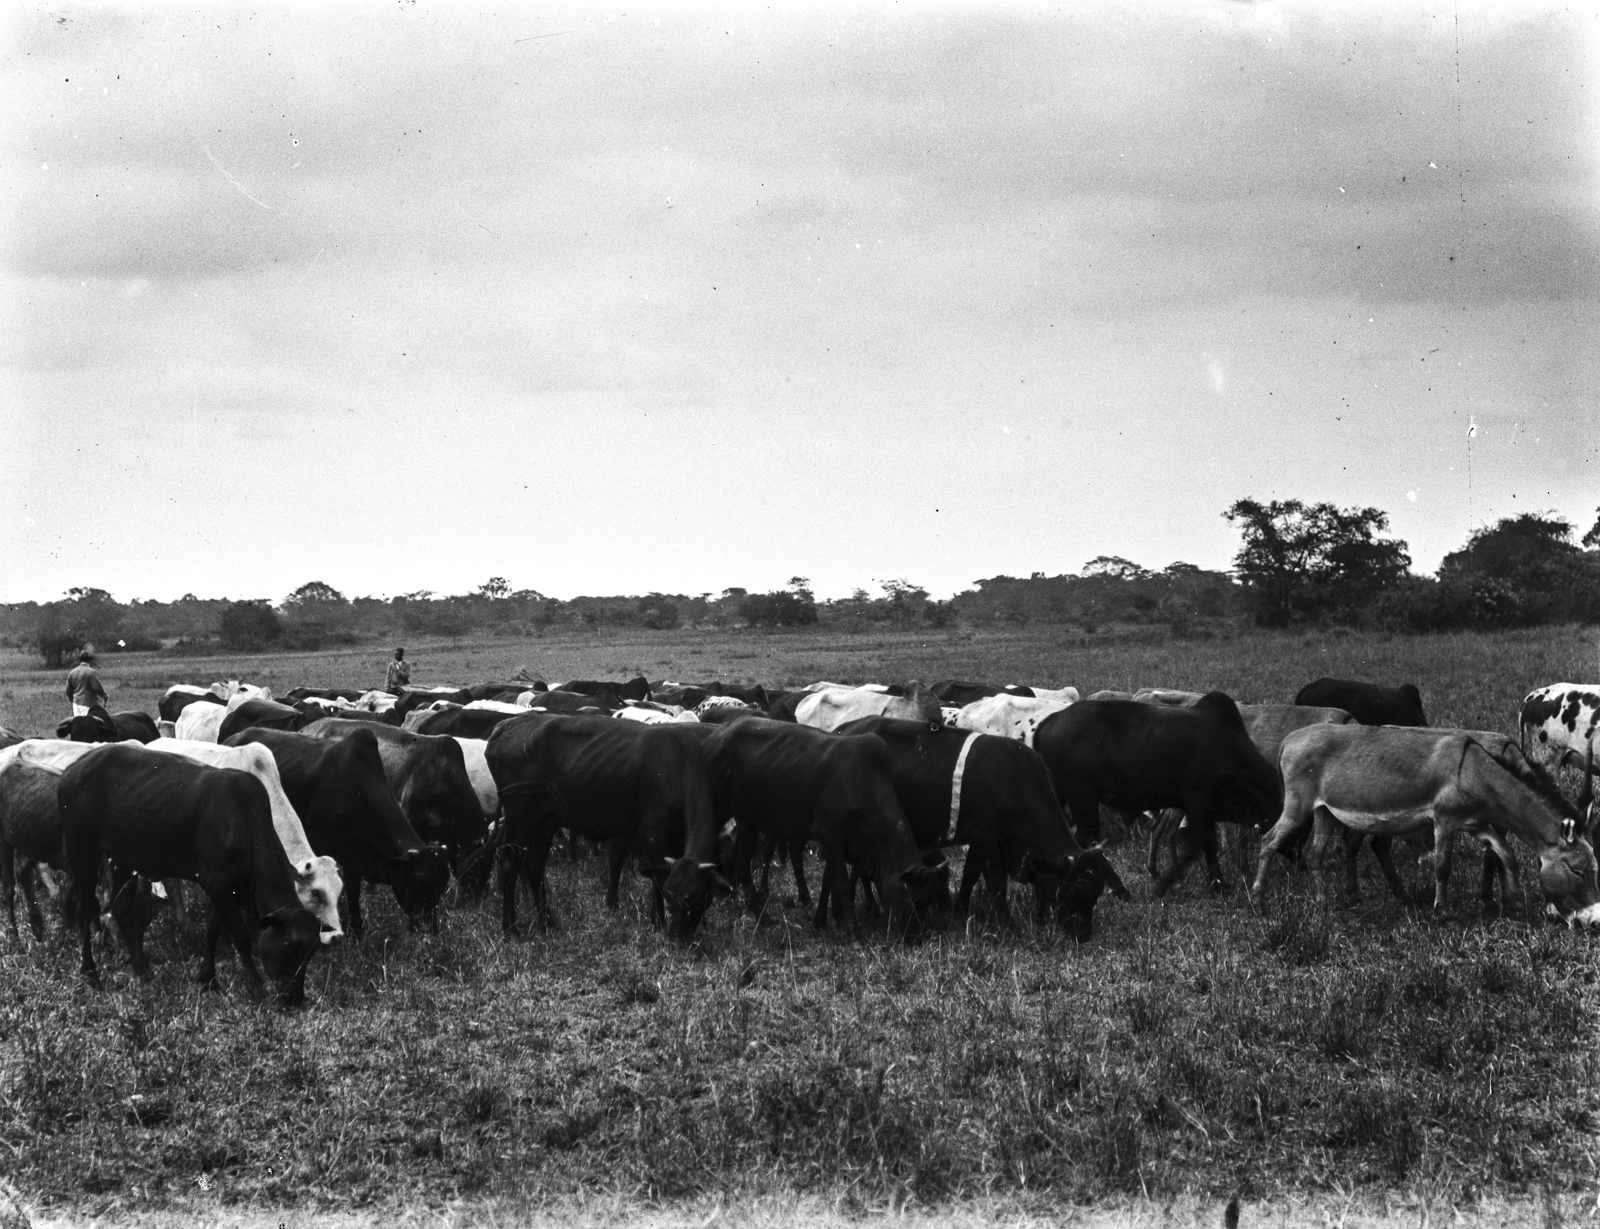 227. Два пастуха со стадом